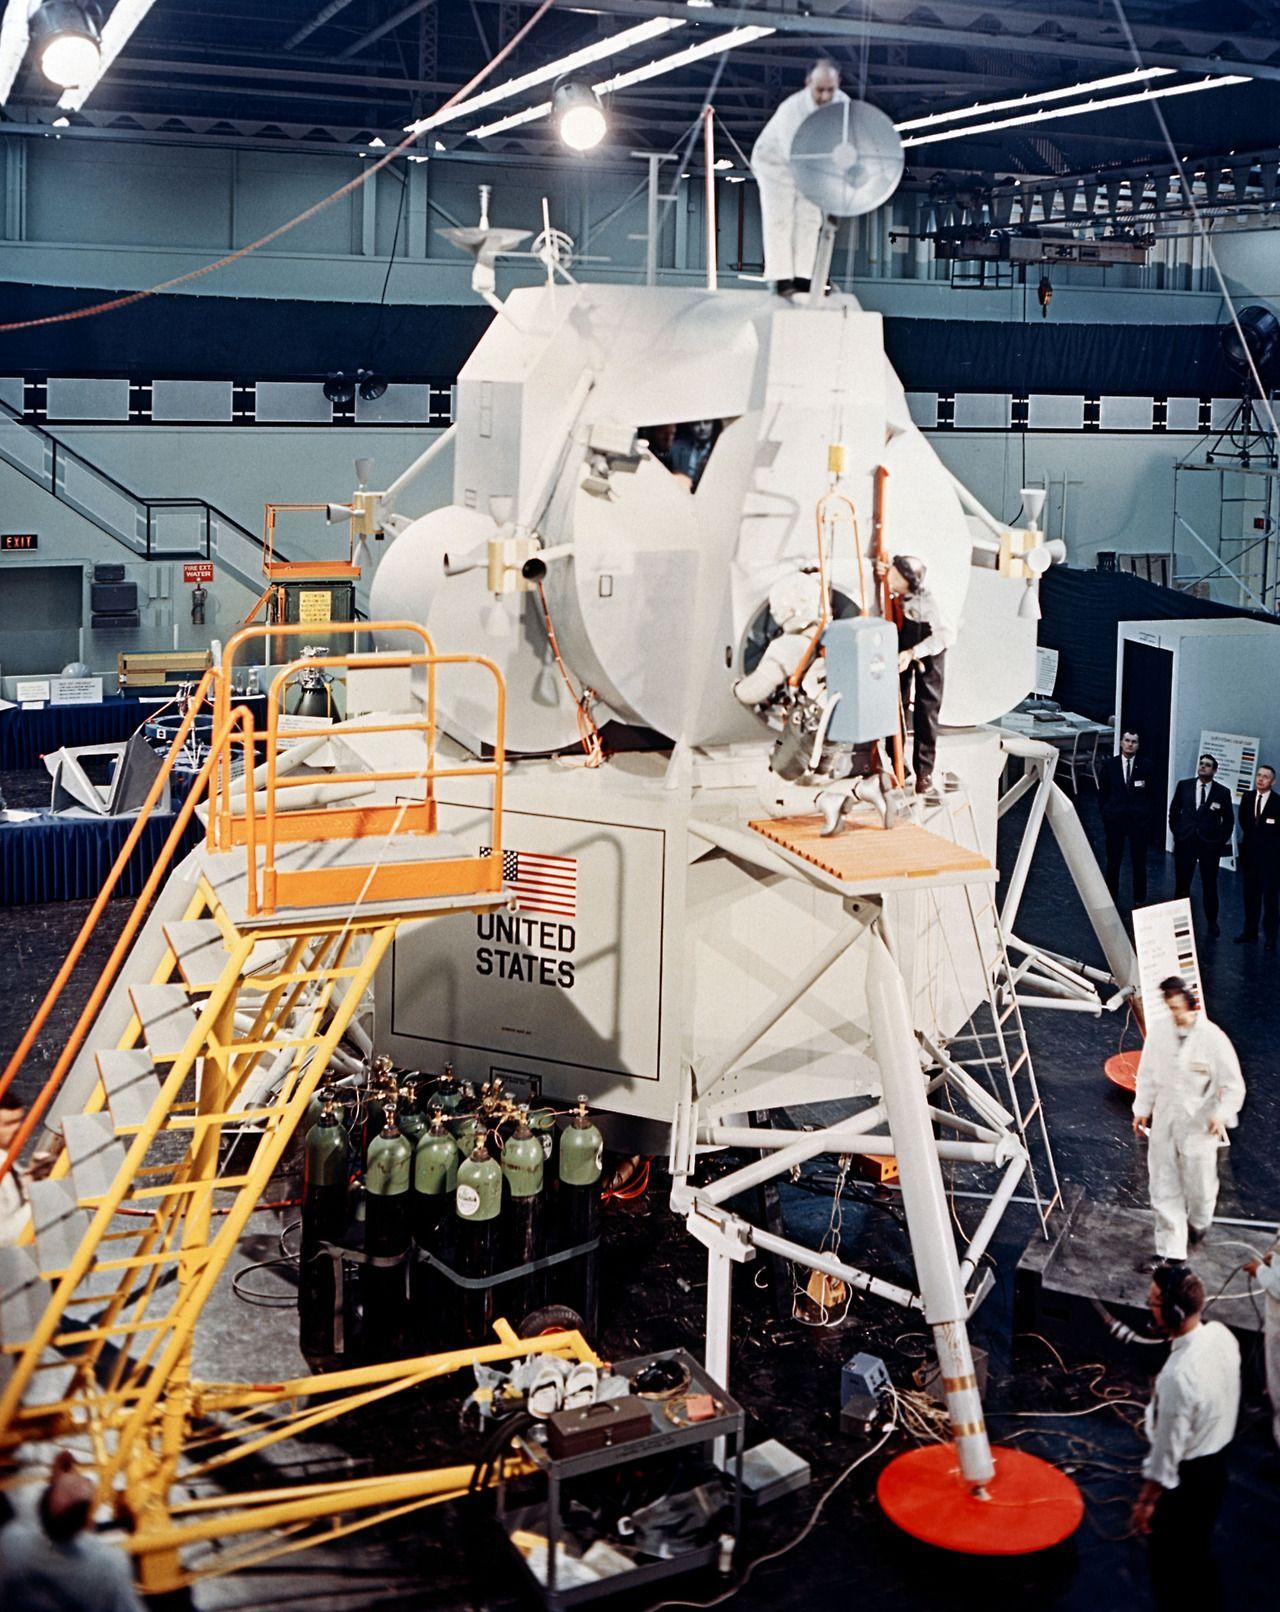 Moon -Art Command /& Service Module The Apollo Missions by Mark Karvon NASA